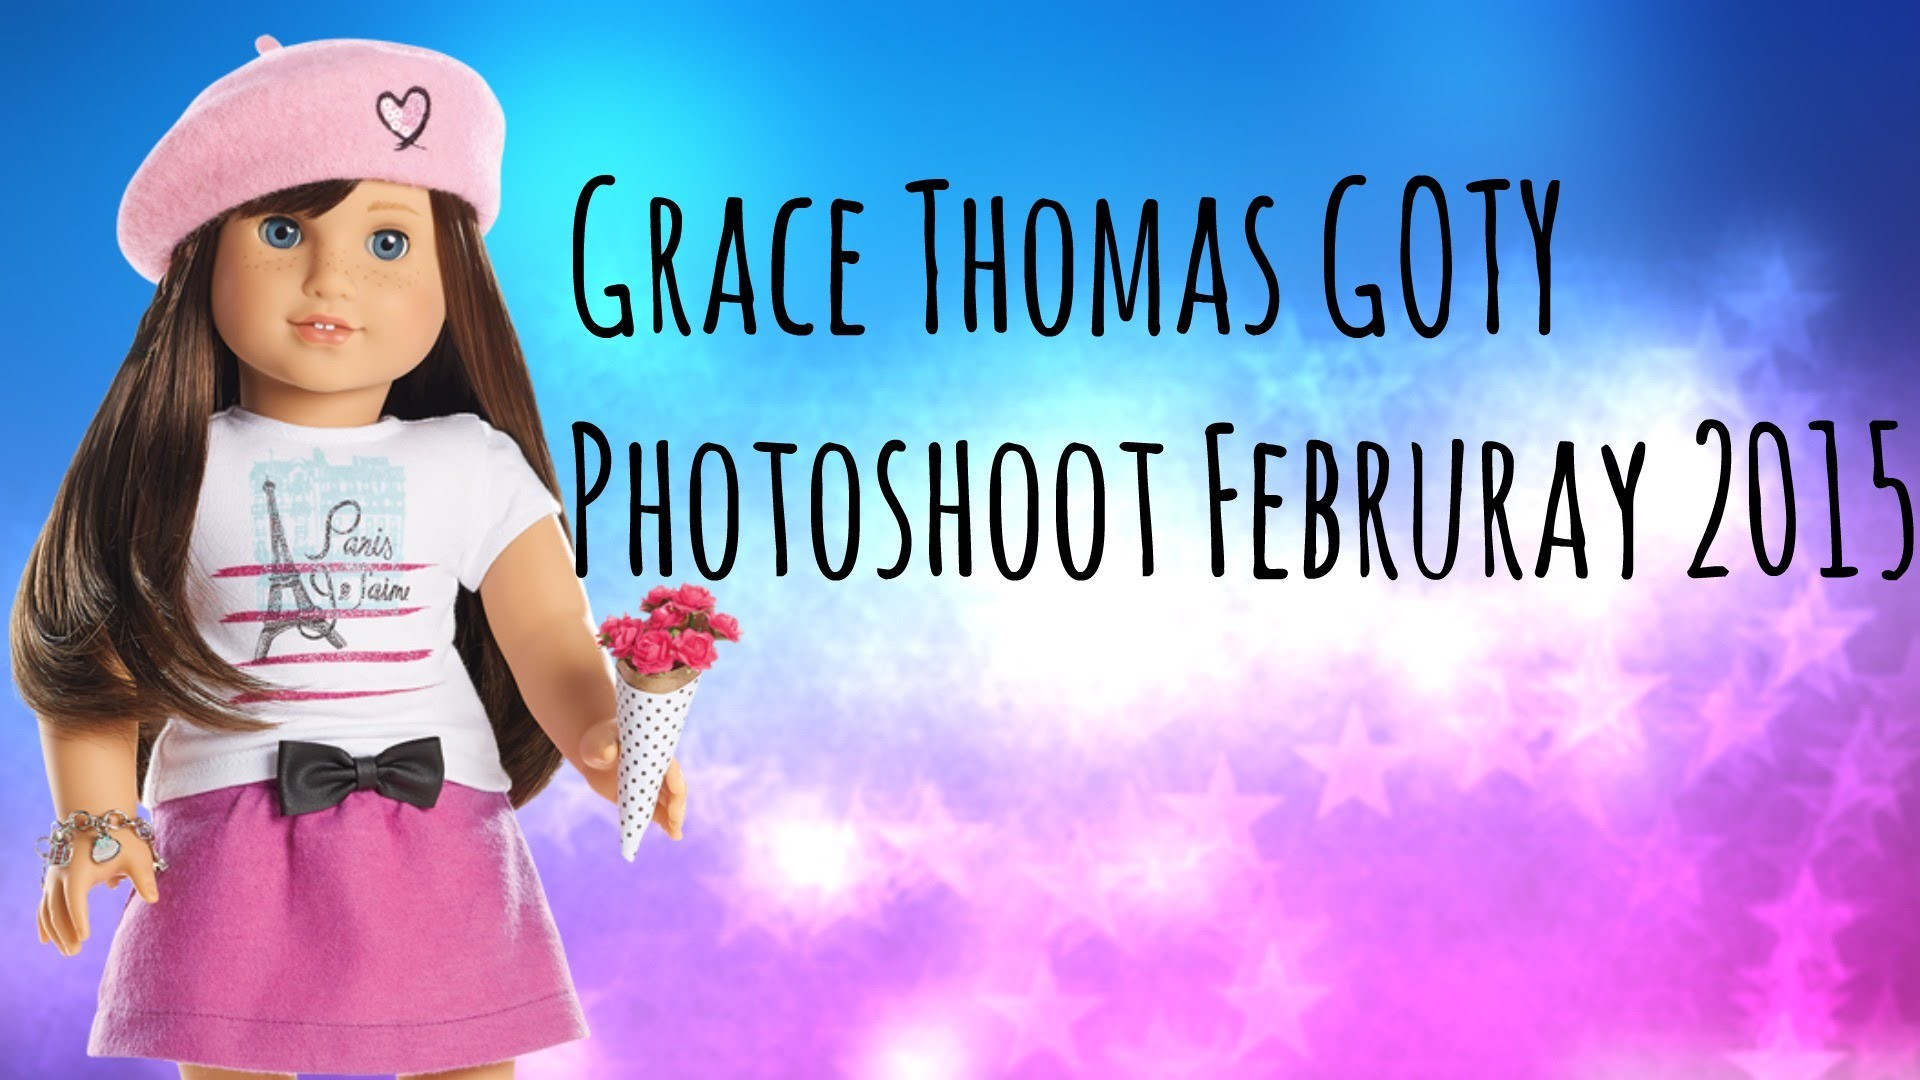 American Girl Grace Thomas GOTY Photoshoot & Slideshow!